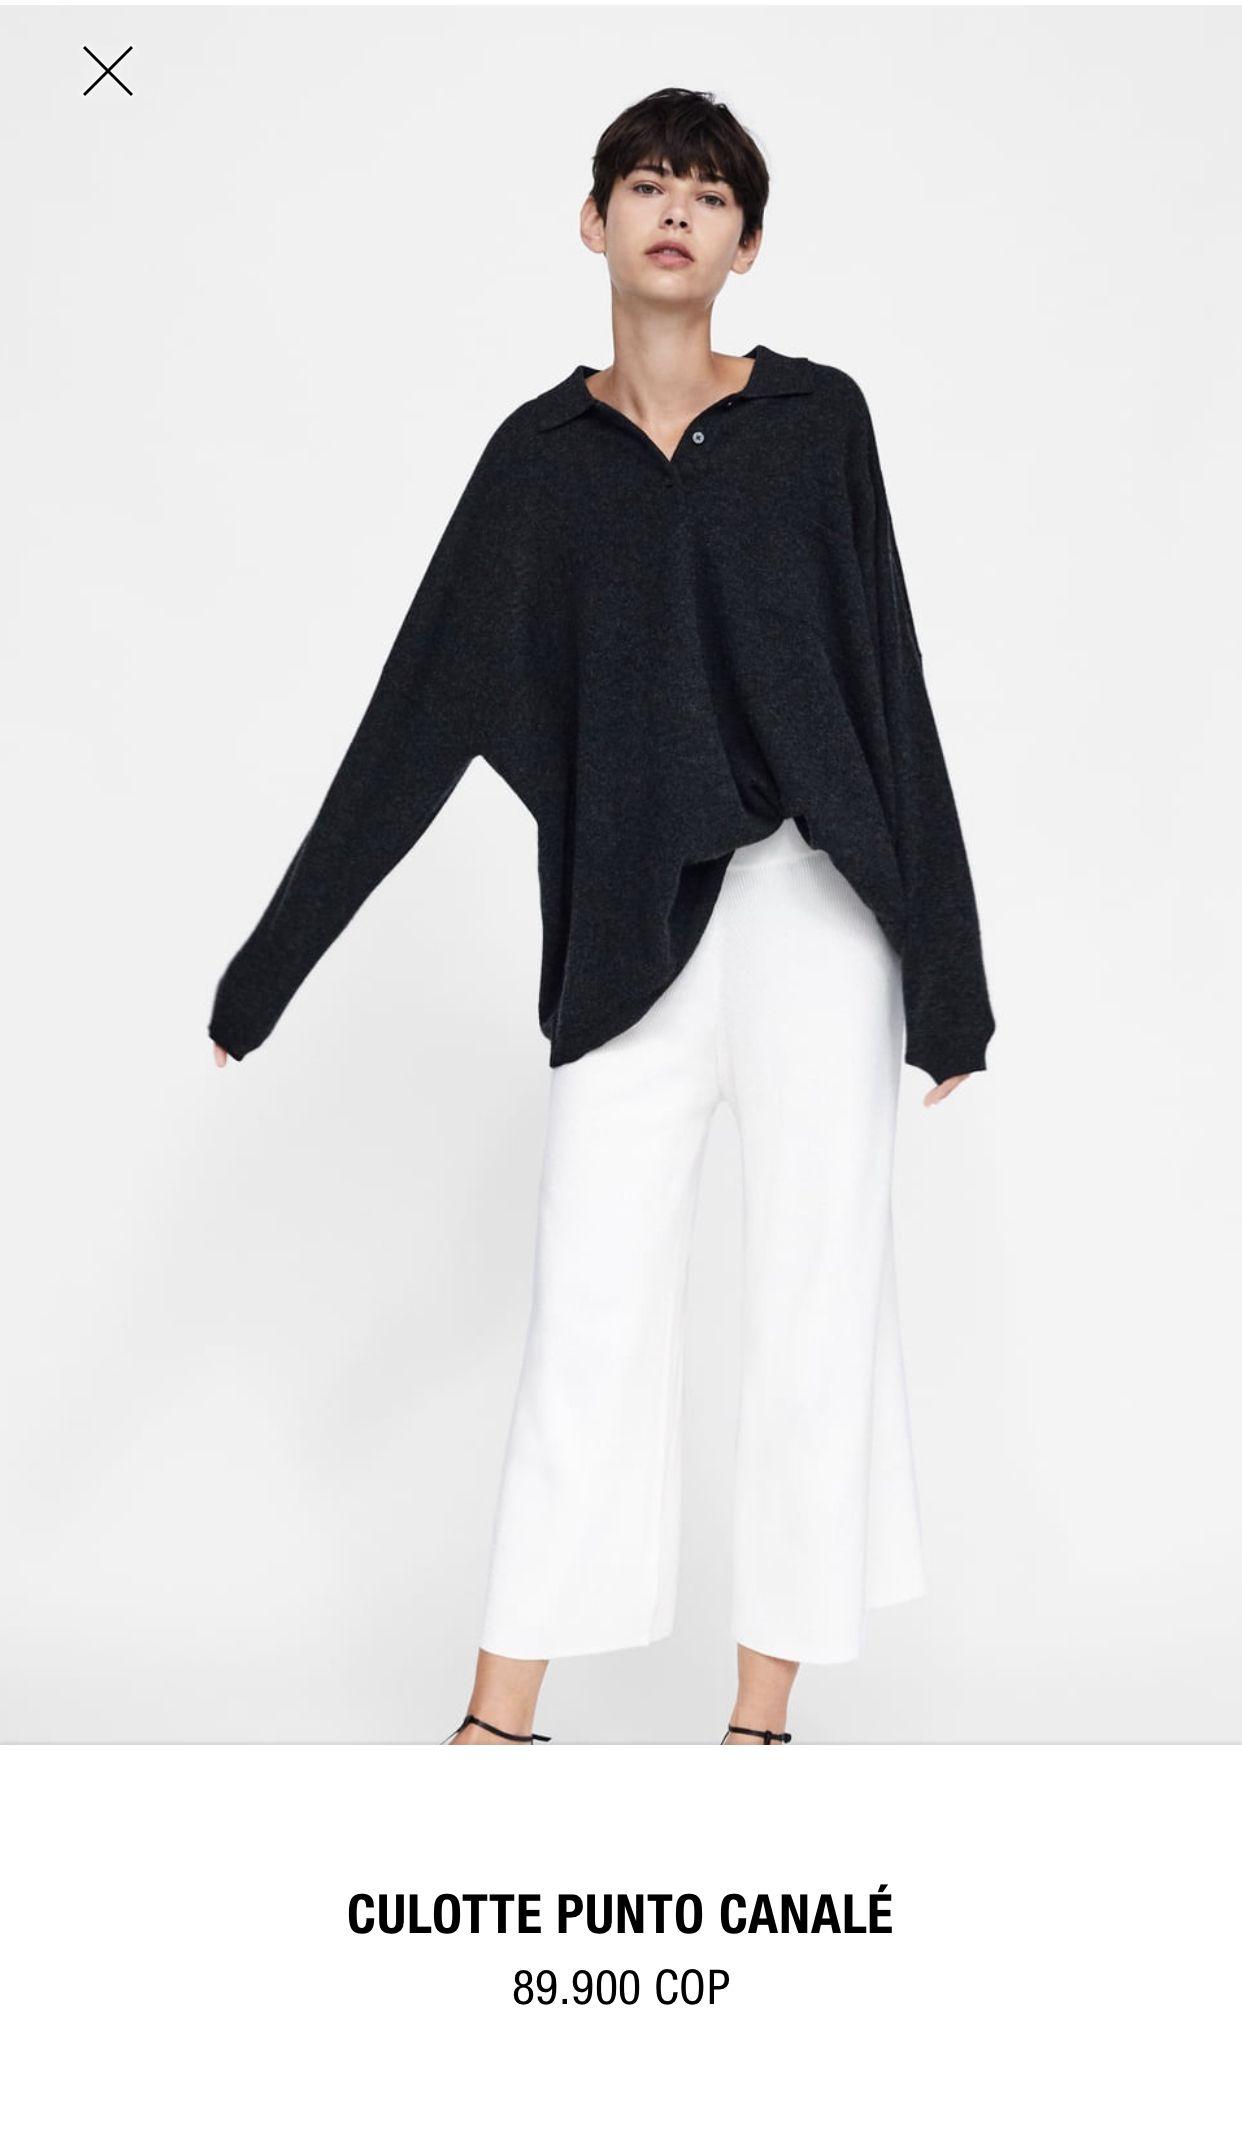 Pin de Adriana Maria en Outfit con Blusas negras 7b4fd3f9dc88